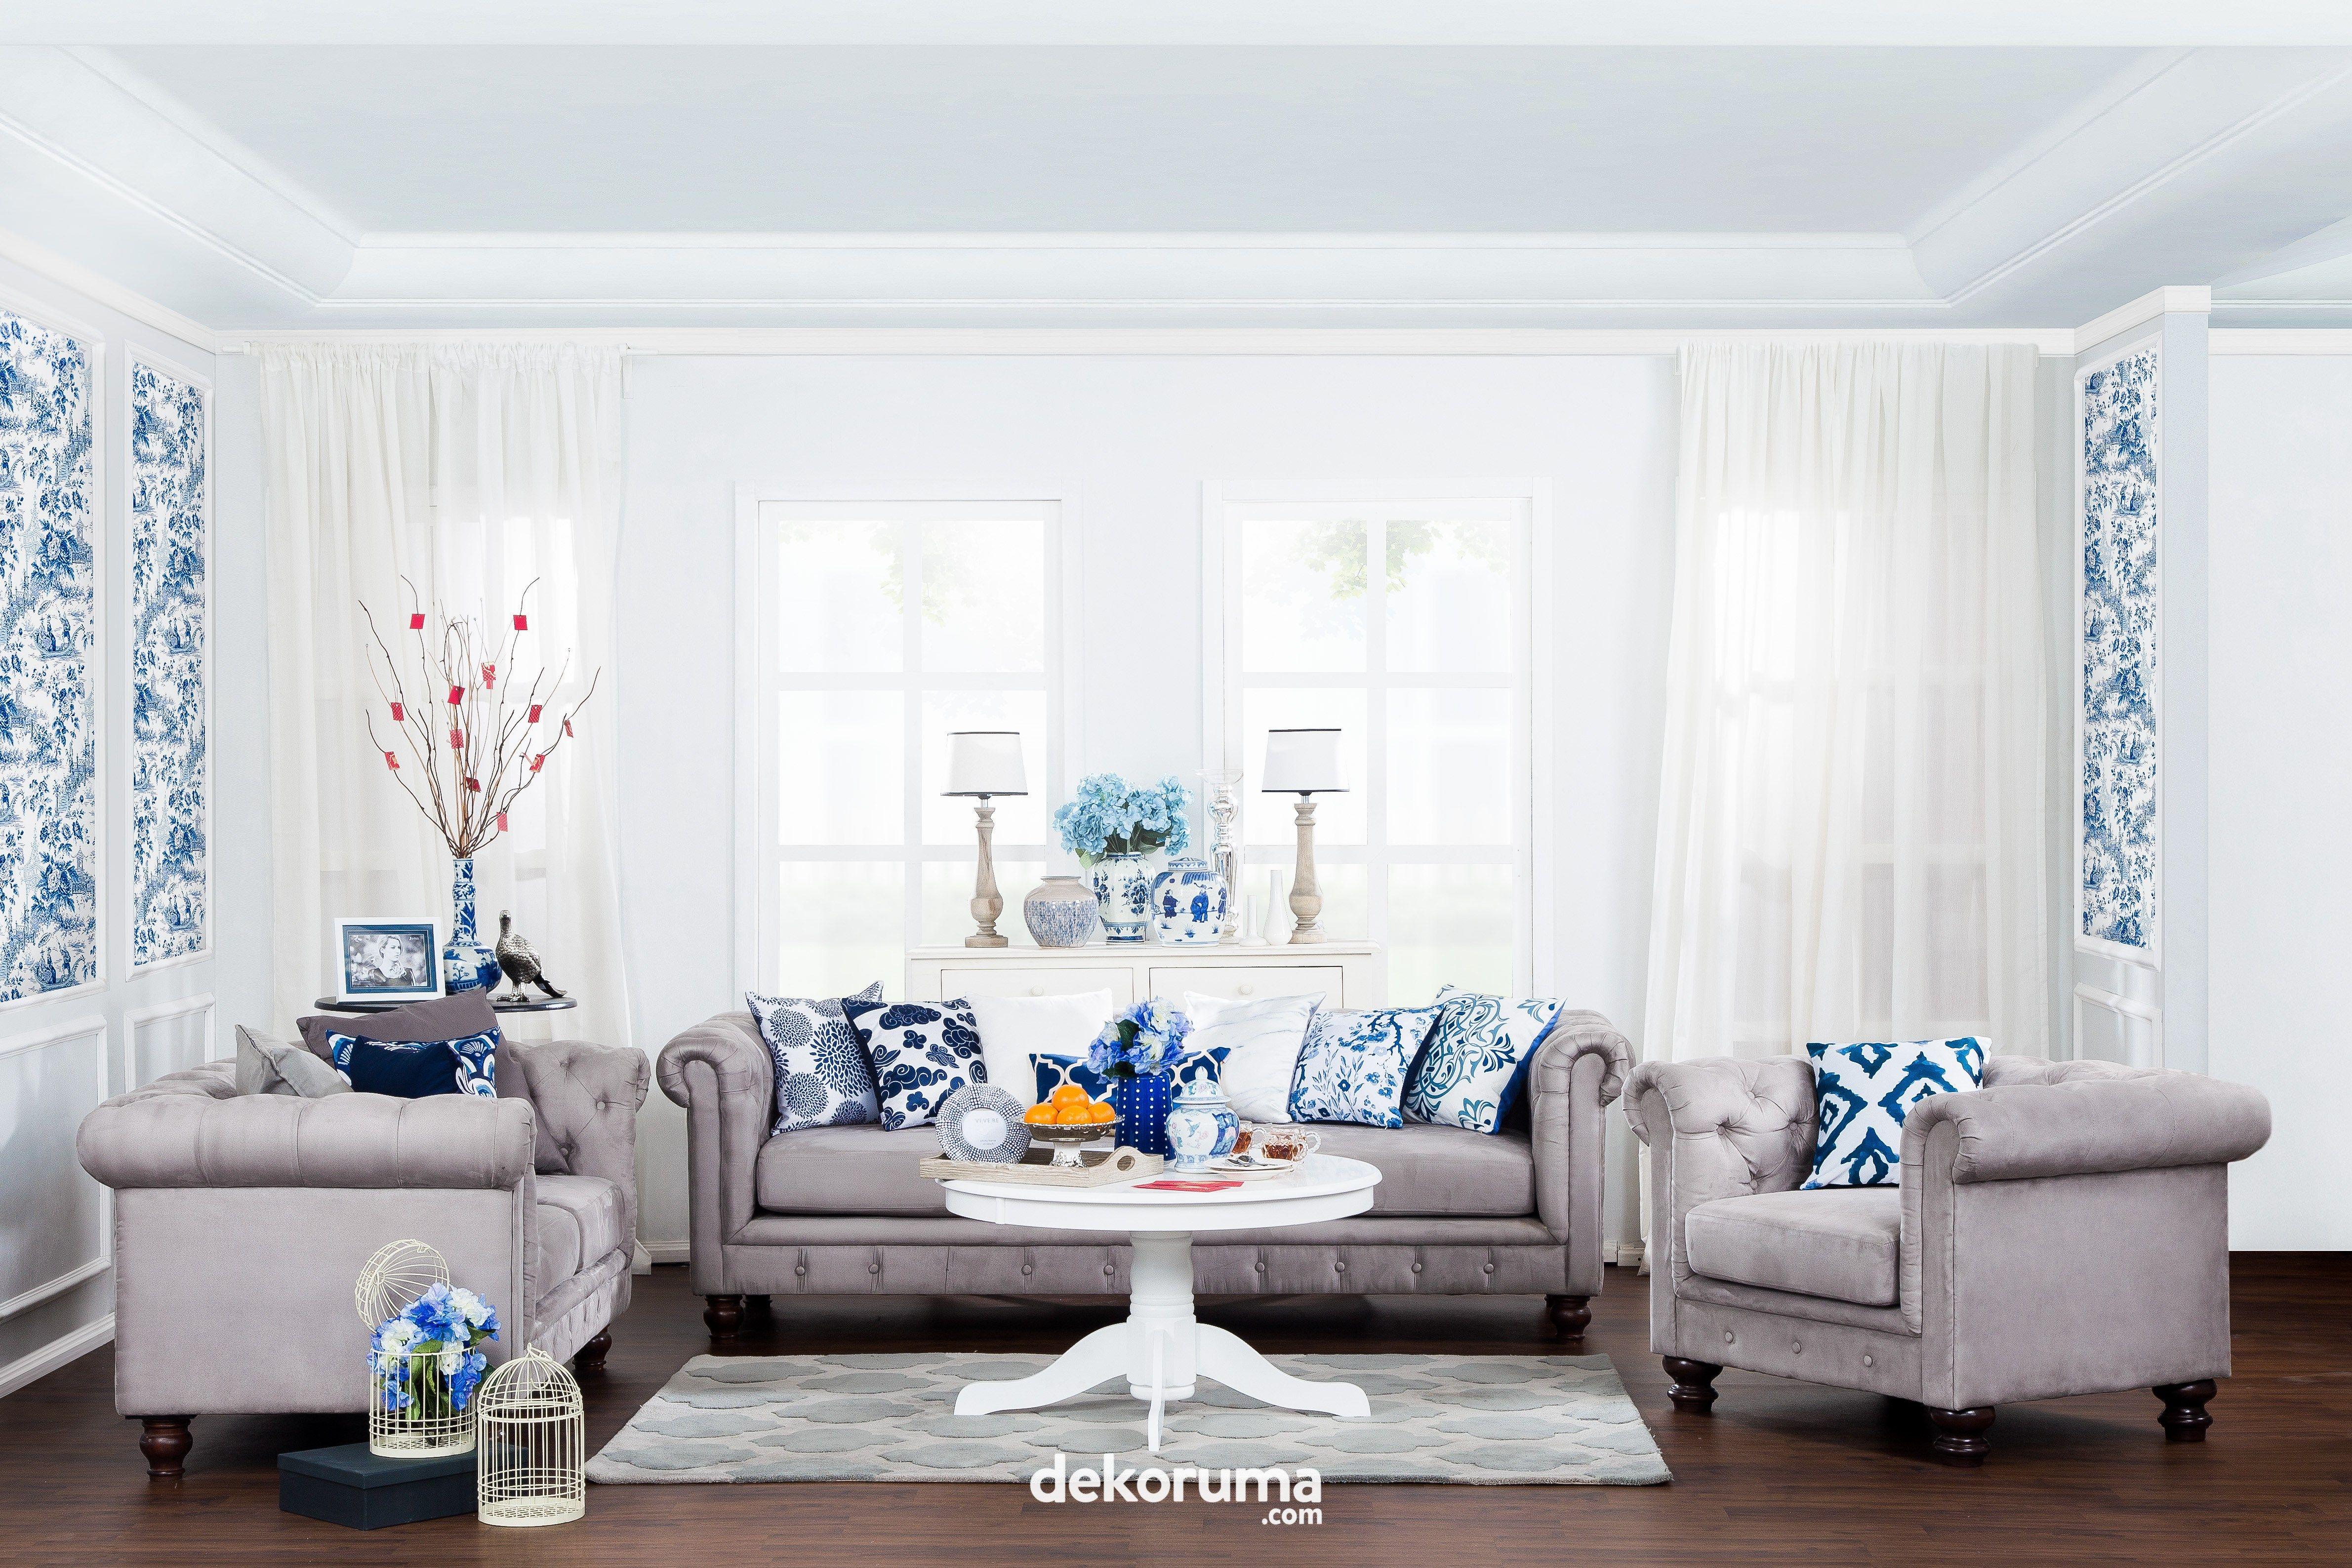 Inspirasi Ruang Tamu Nuansa Biru Minimalis Fungsional Minimalis Ruangan Dekorasi Rumah